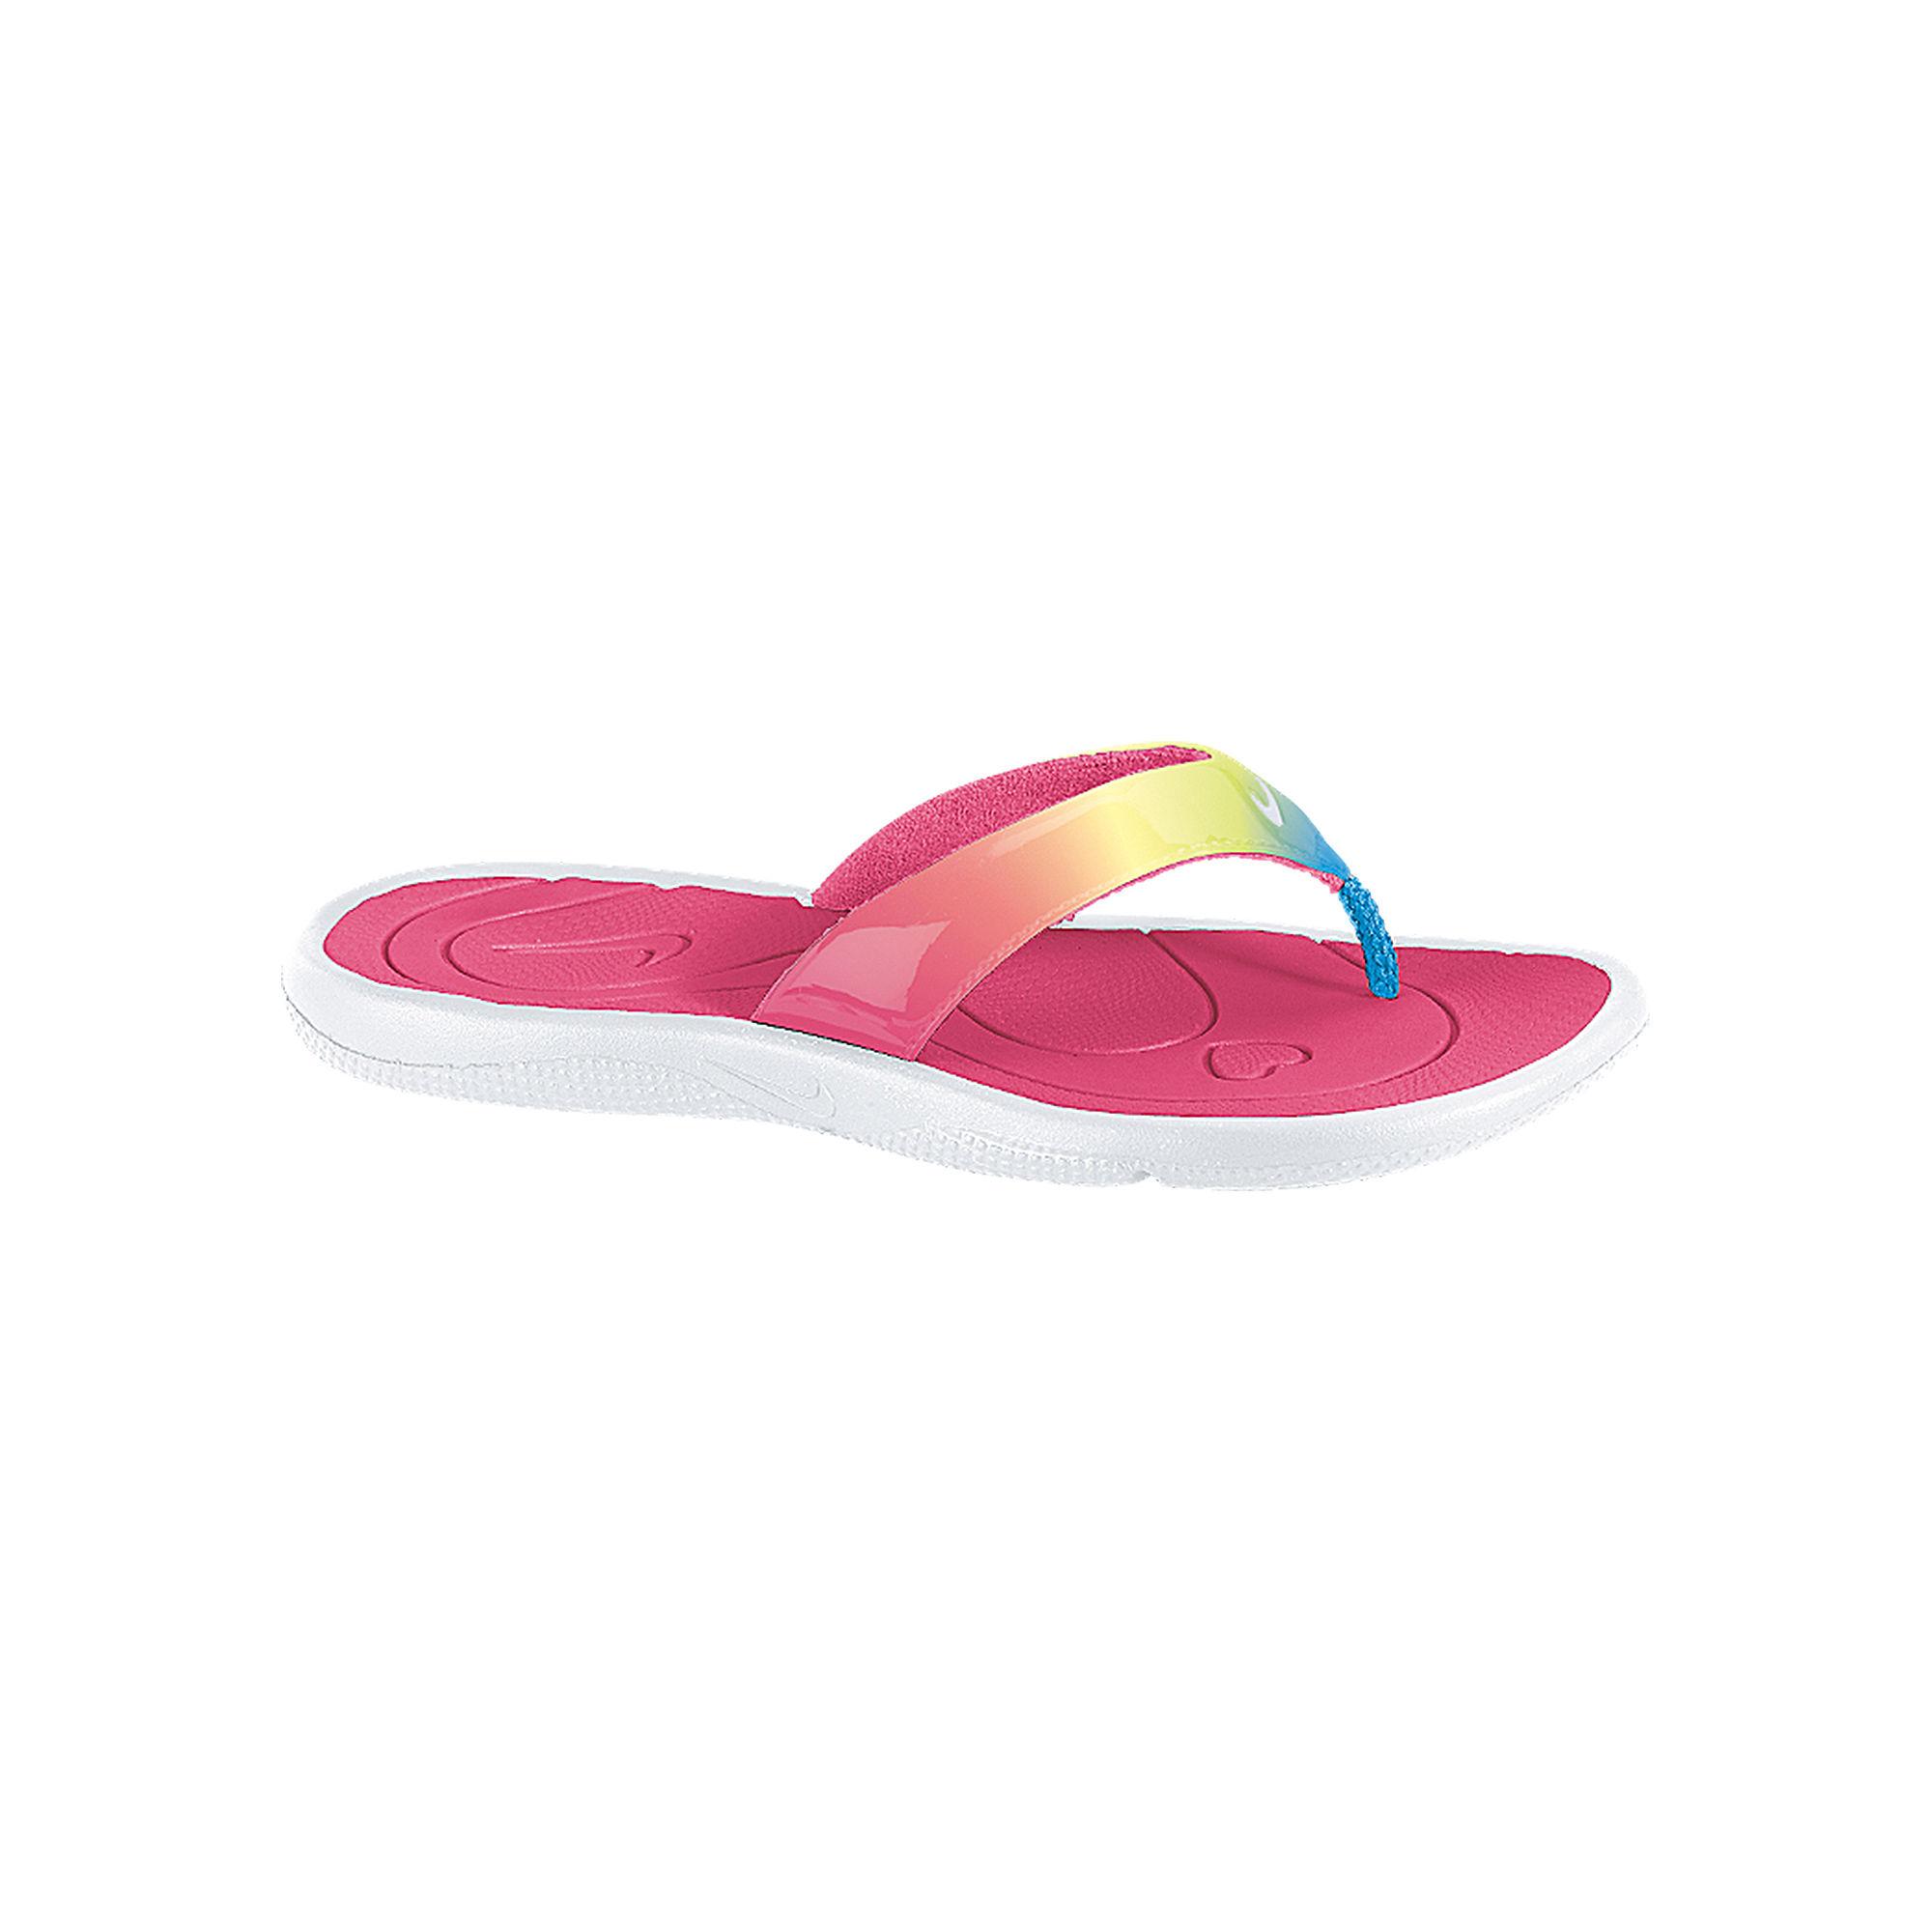 ff6dc82db84fd ... UPC 091205142572 product image for Nike Aqua Motion Girls Flip Flops -  Little Kids Big